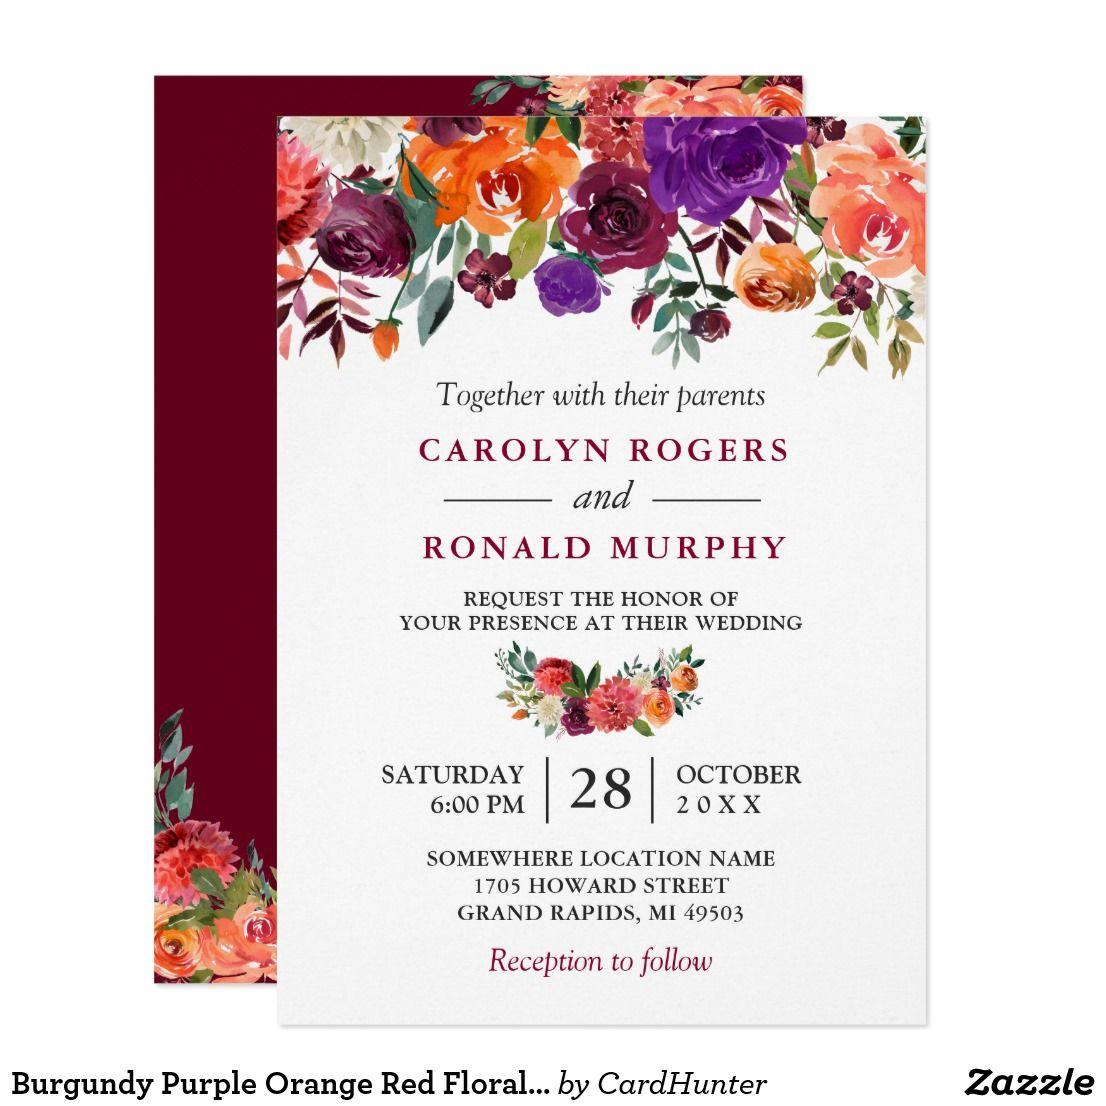 Burgundy Purple Orange Red Floral Wedding Invitation Zazzle Com